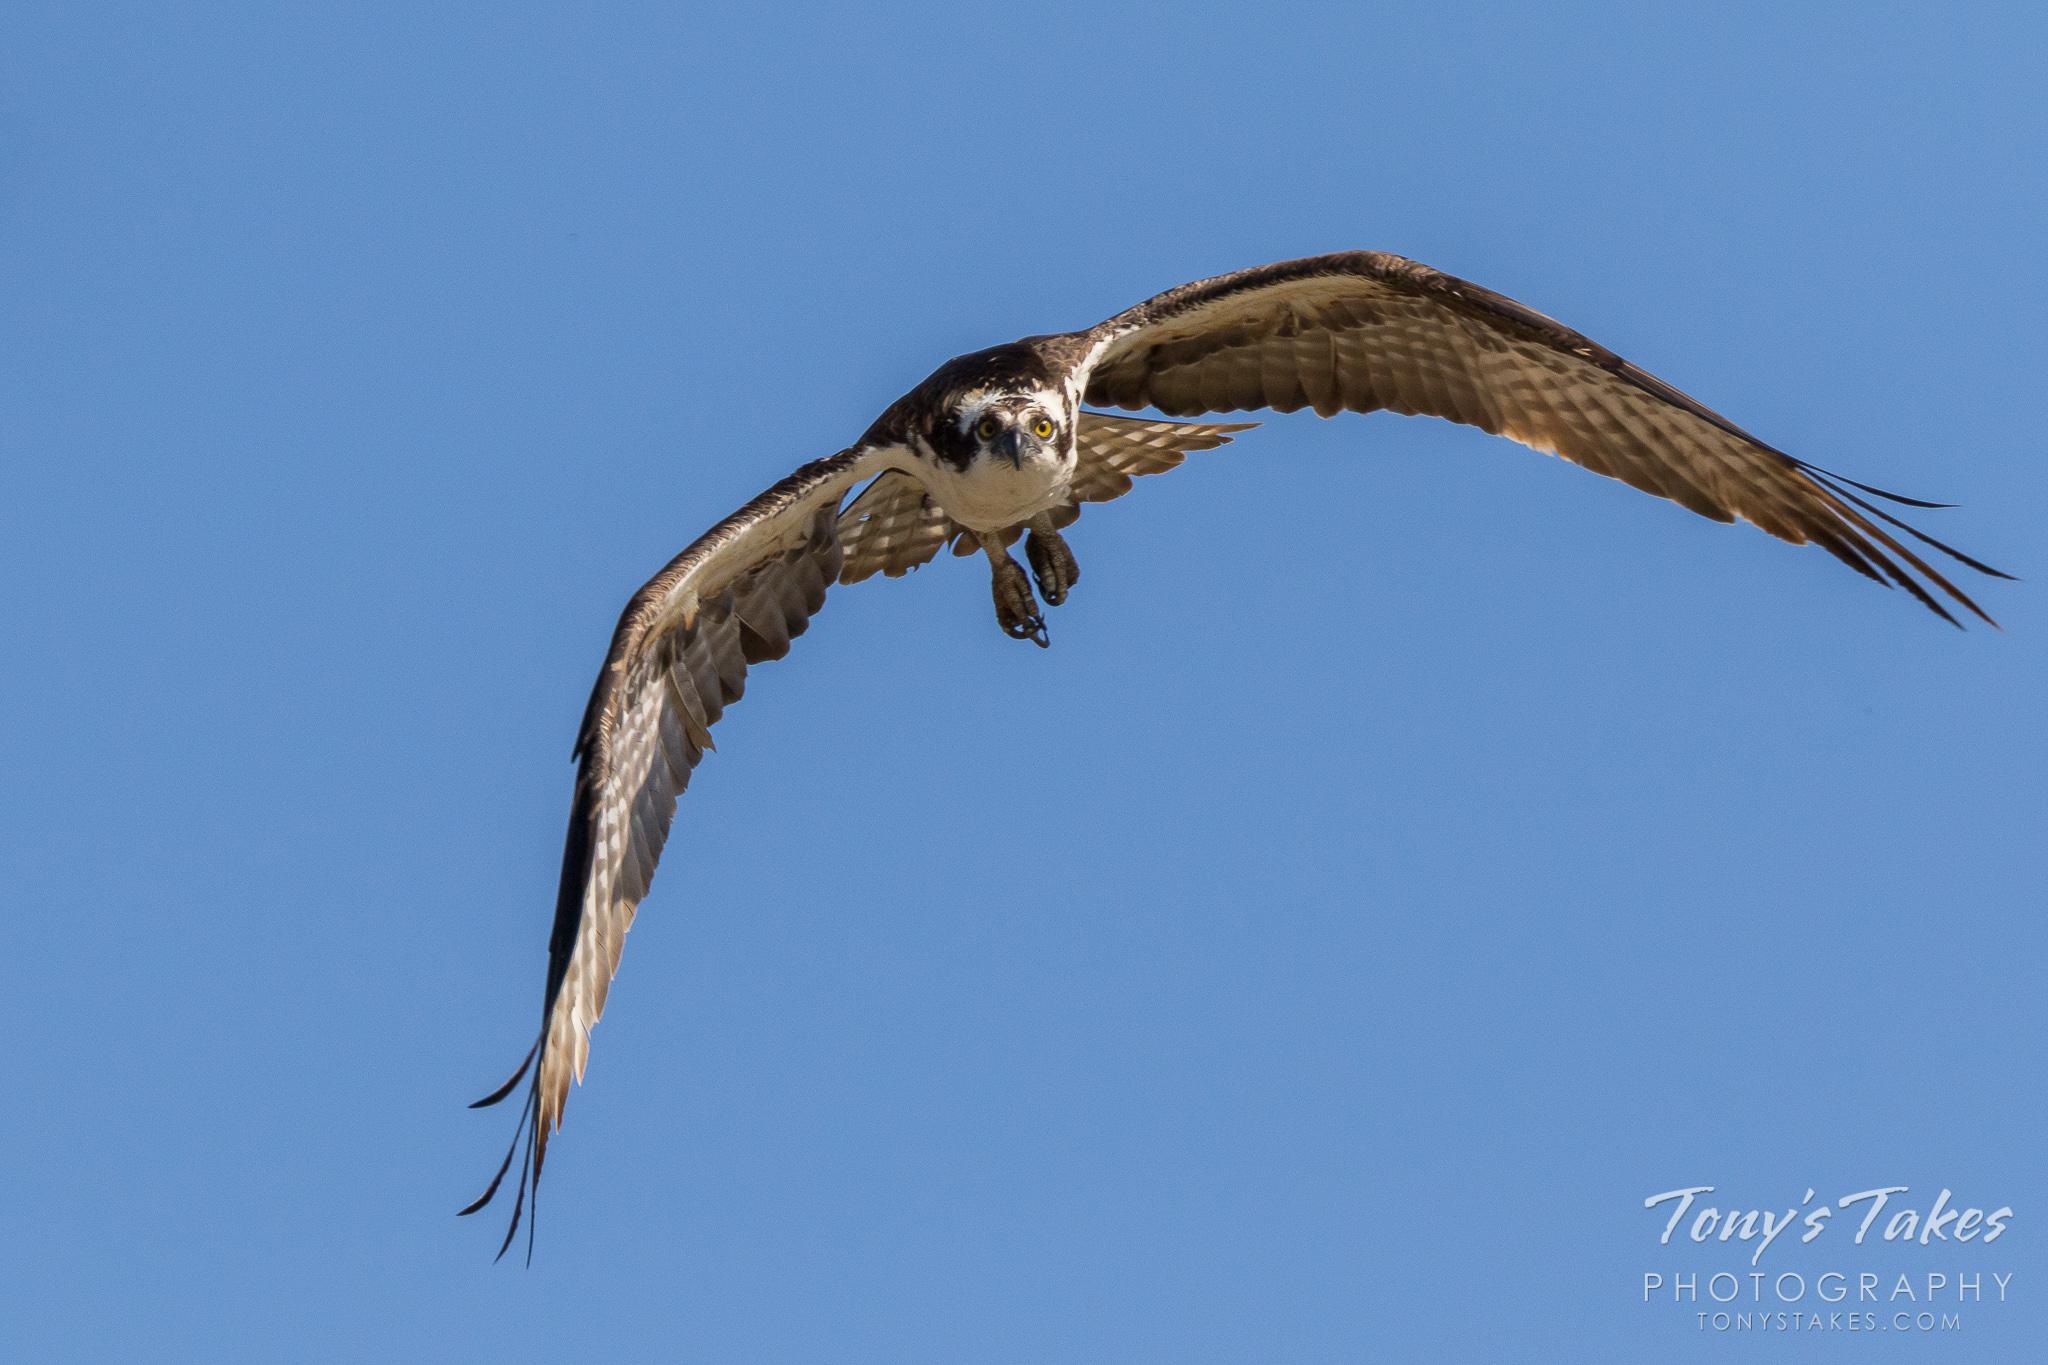 Osprey's golden eyes stay focused